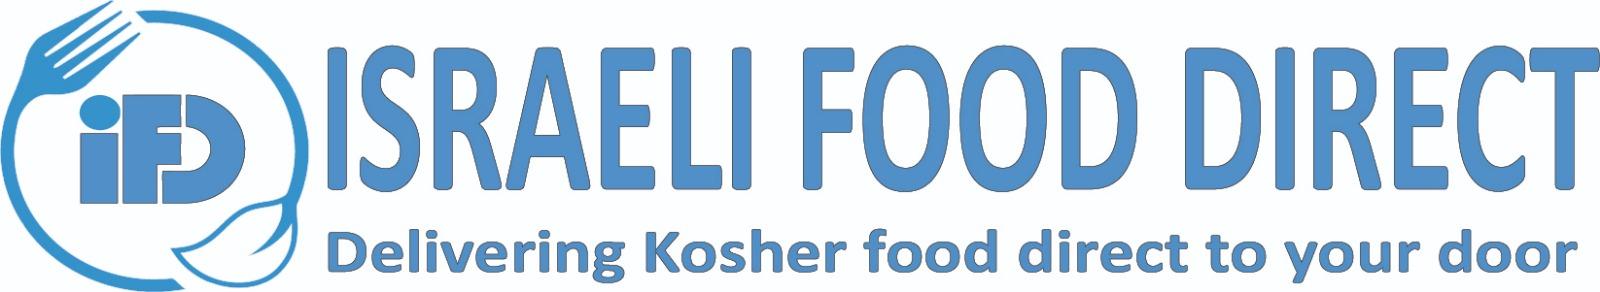 Israeli Food Direct